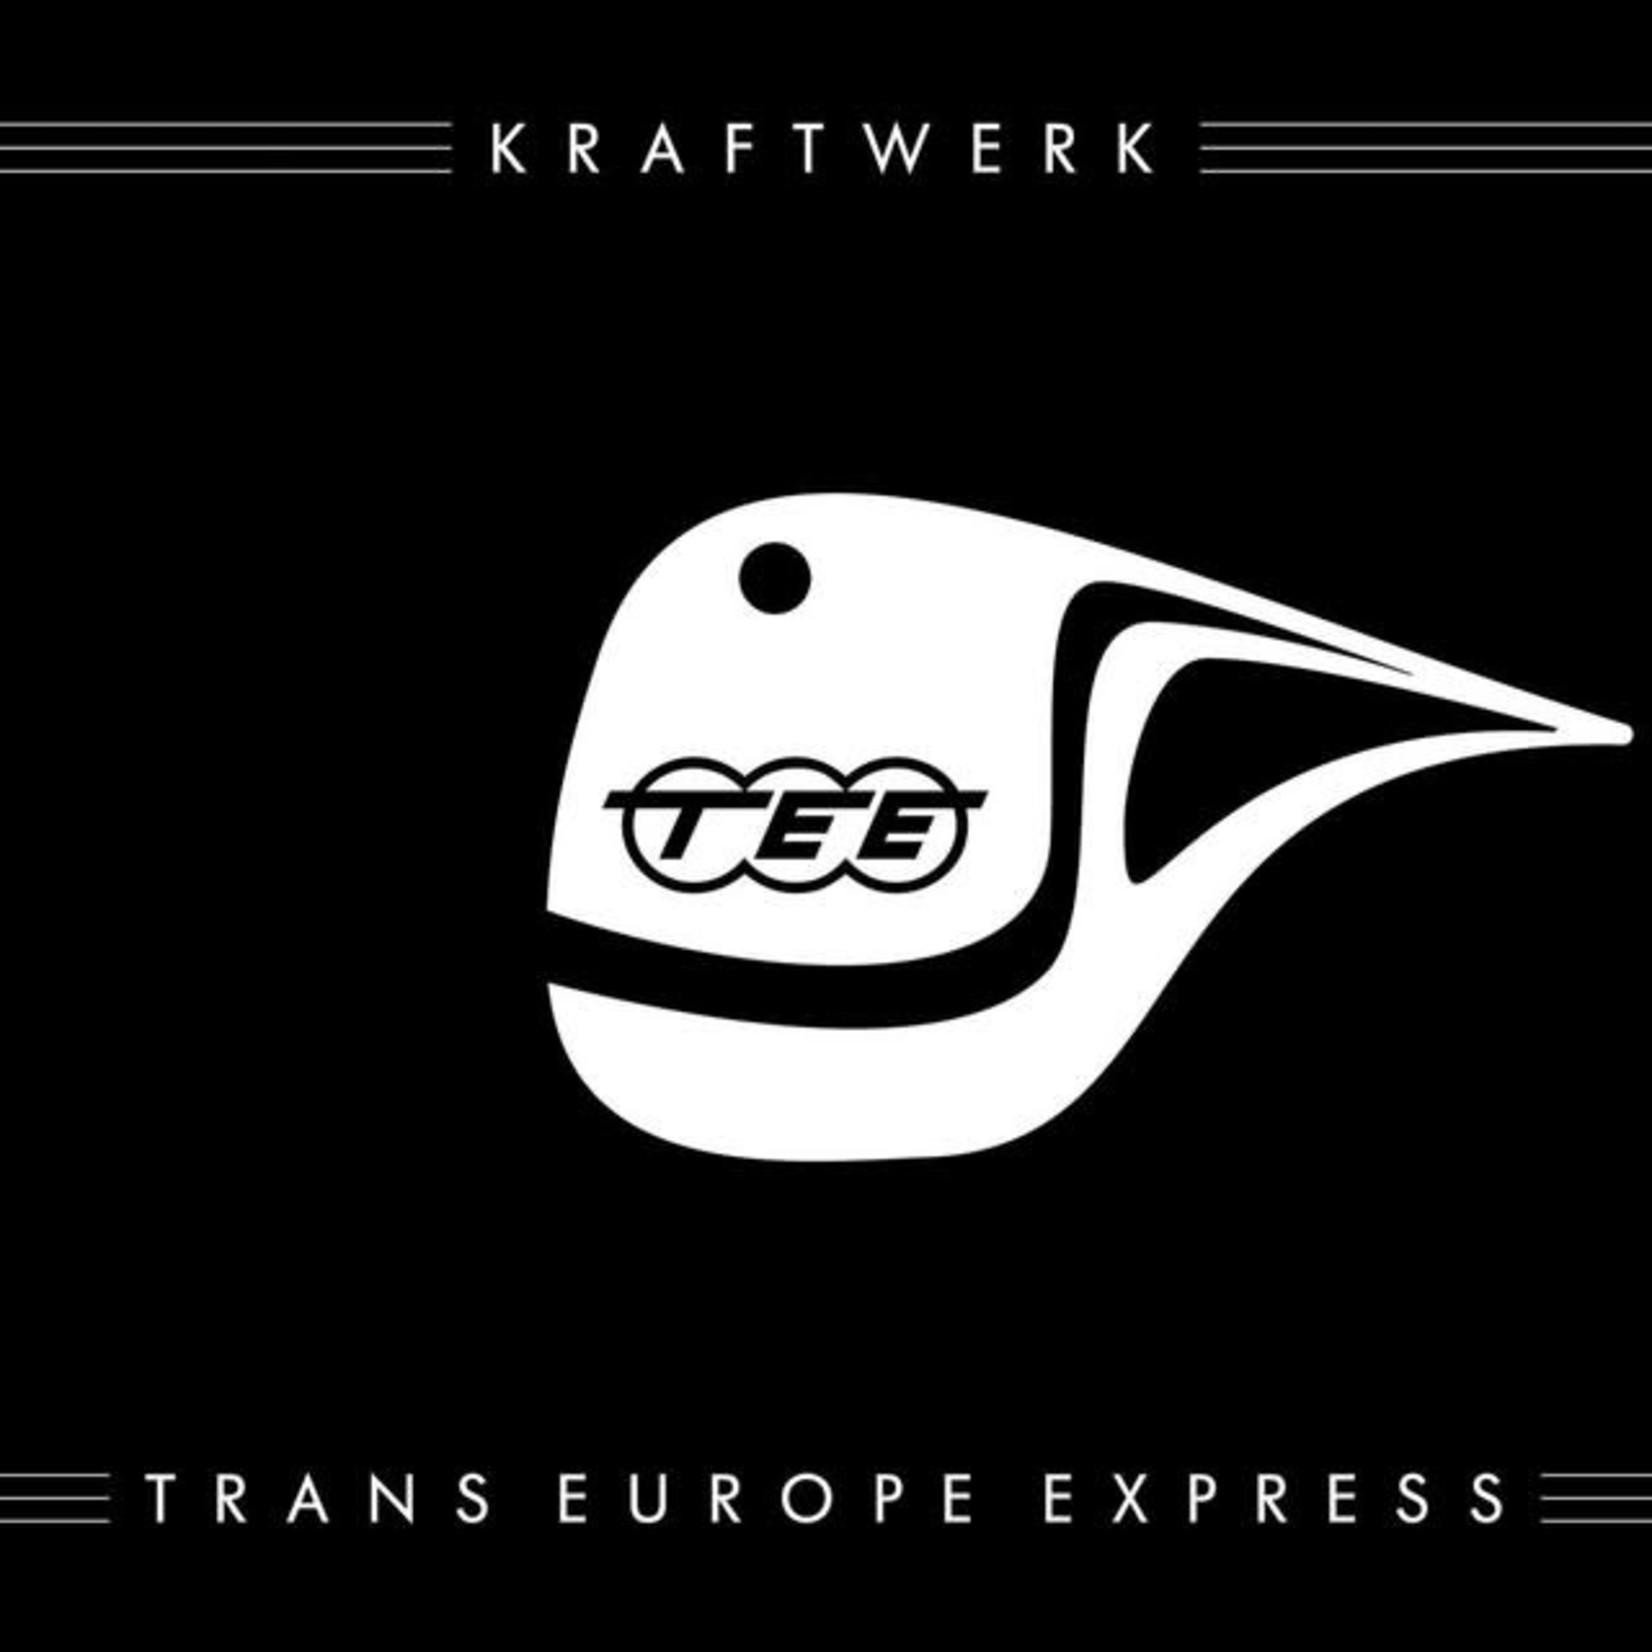 Vinyl Kraftwerk - Trans Europe Express